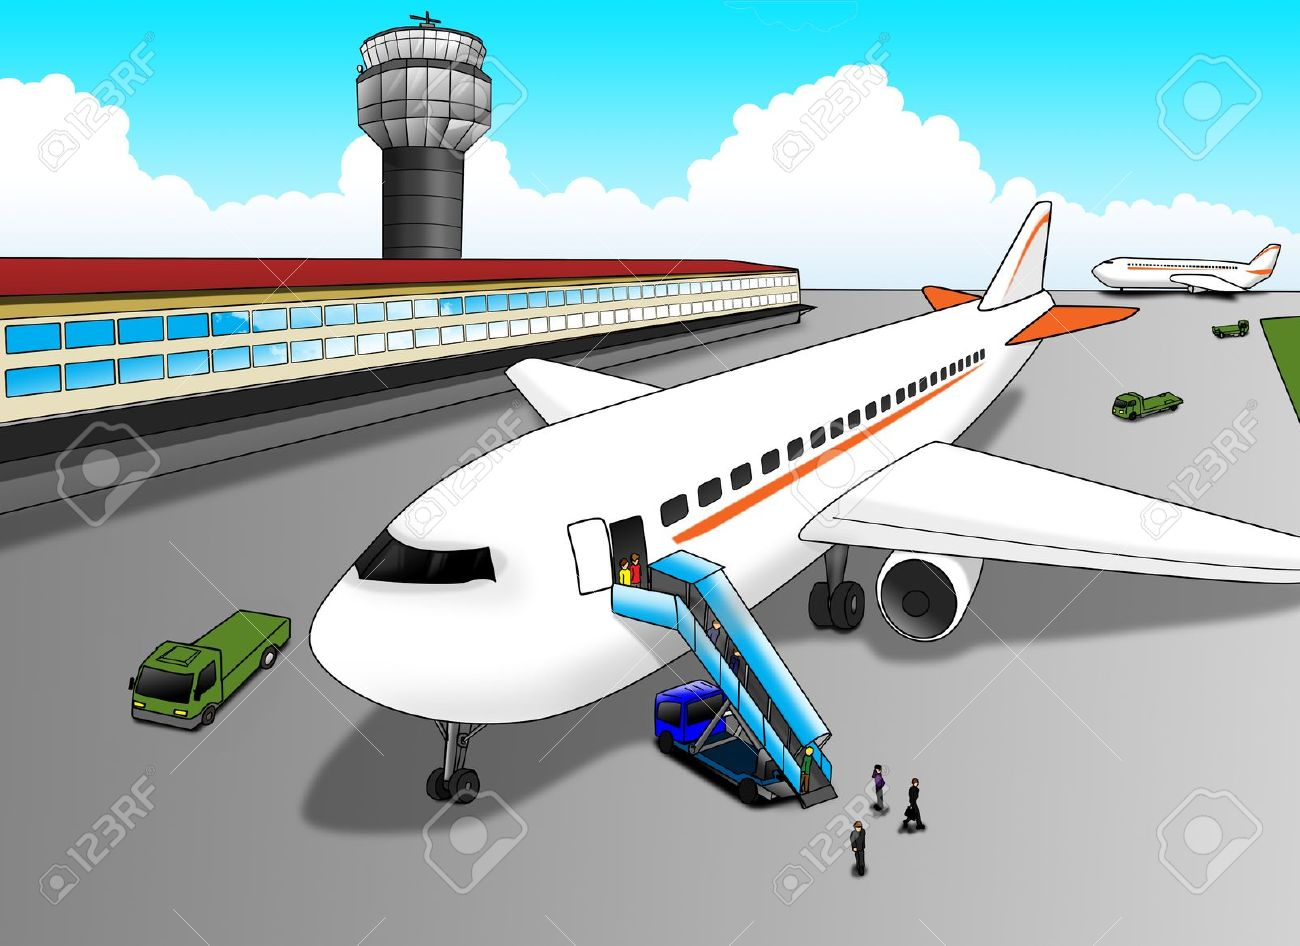 Aeroporto Cristiano Ronaldo : This and that aeroporto cristiano ronaldo